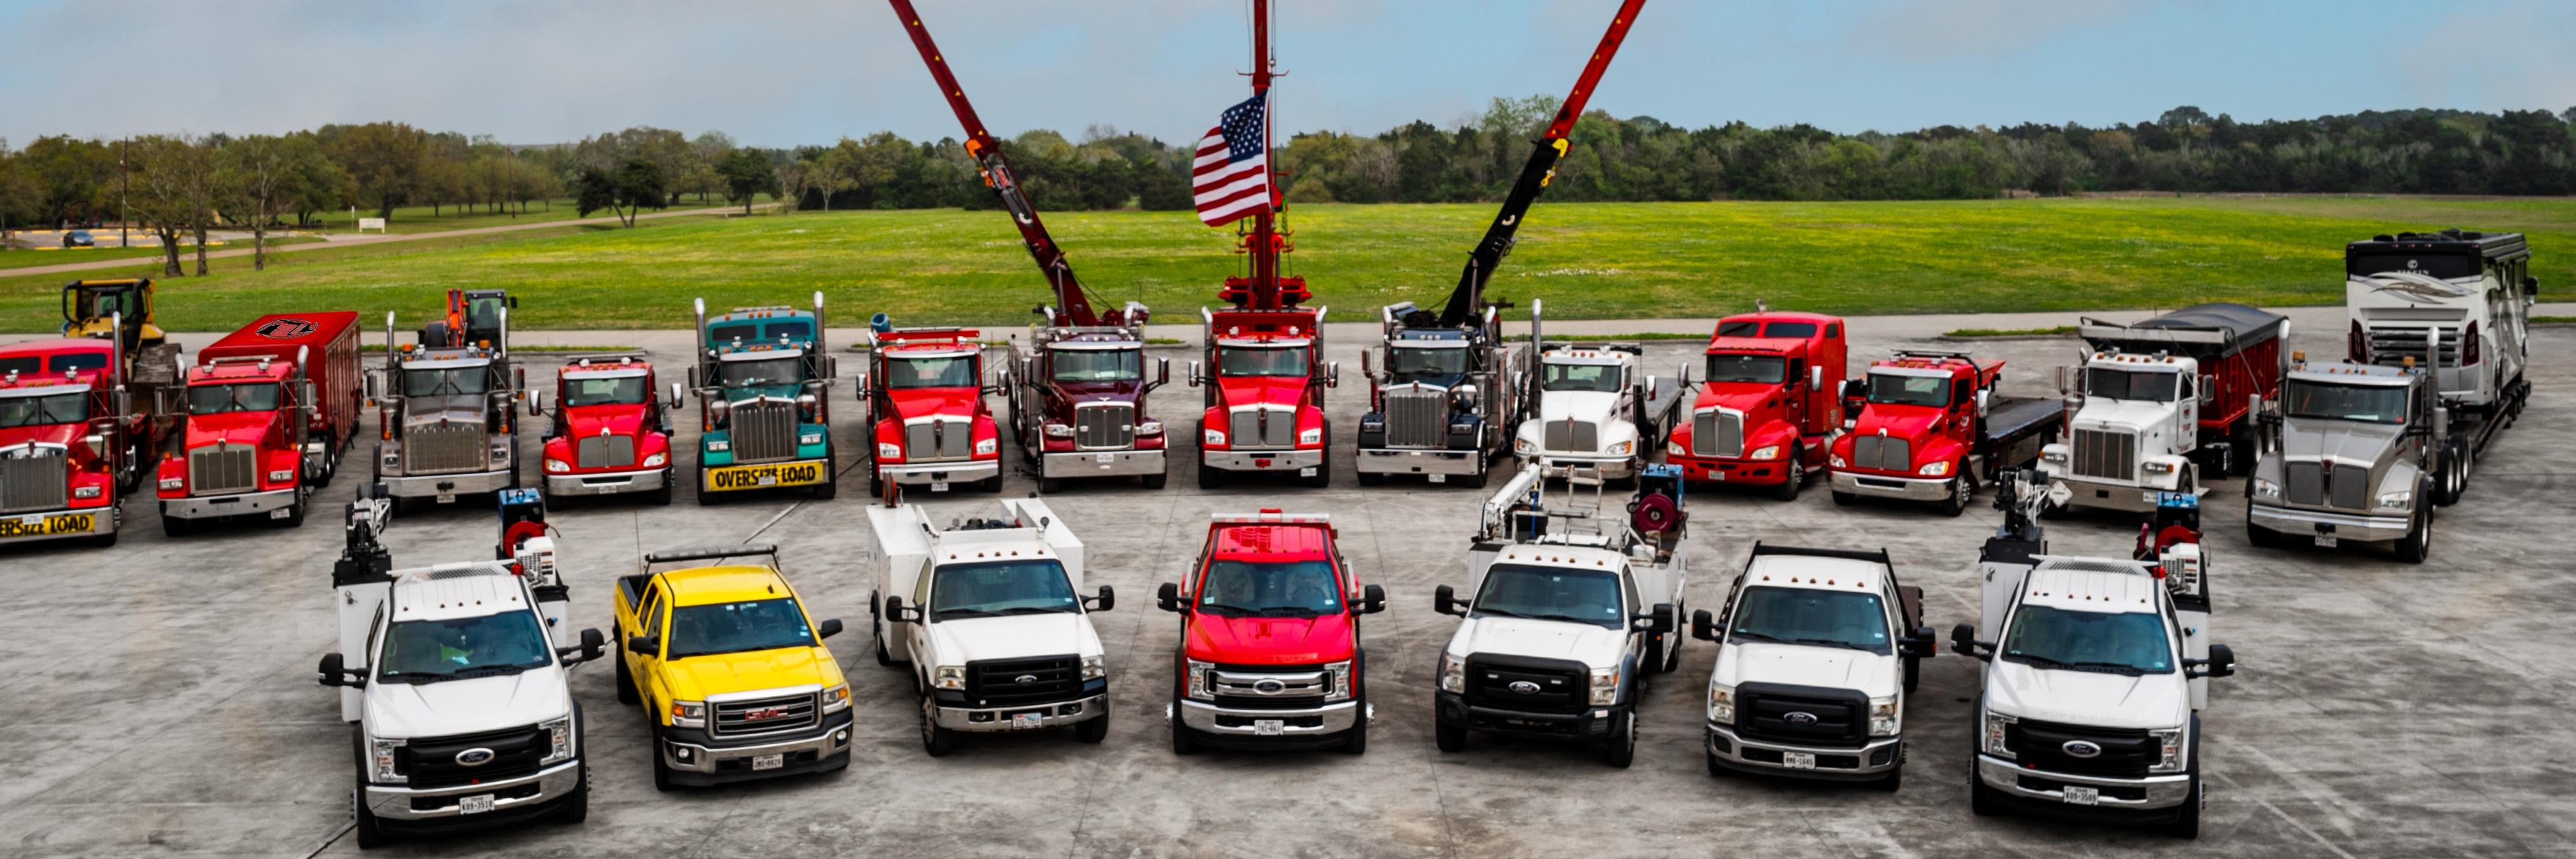 Gass Automotive, Inc. Towing.com Profile Banner